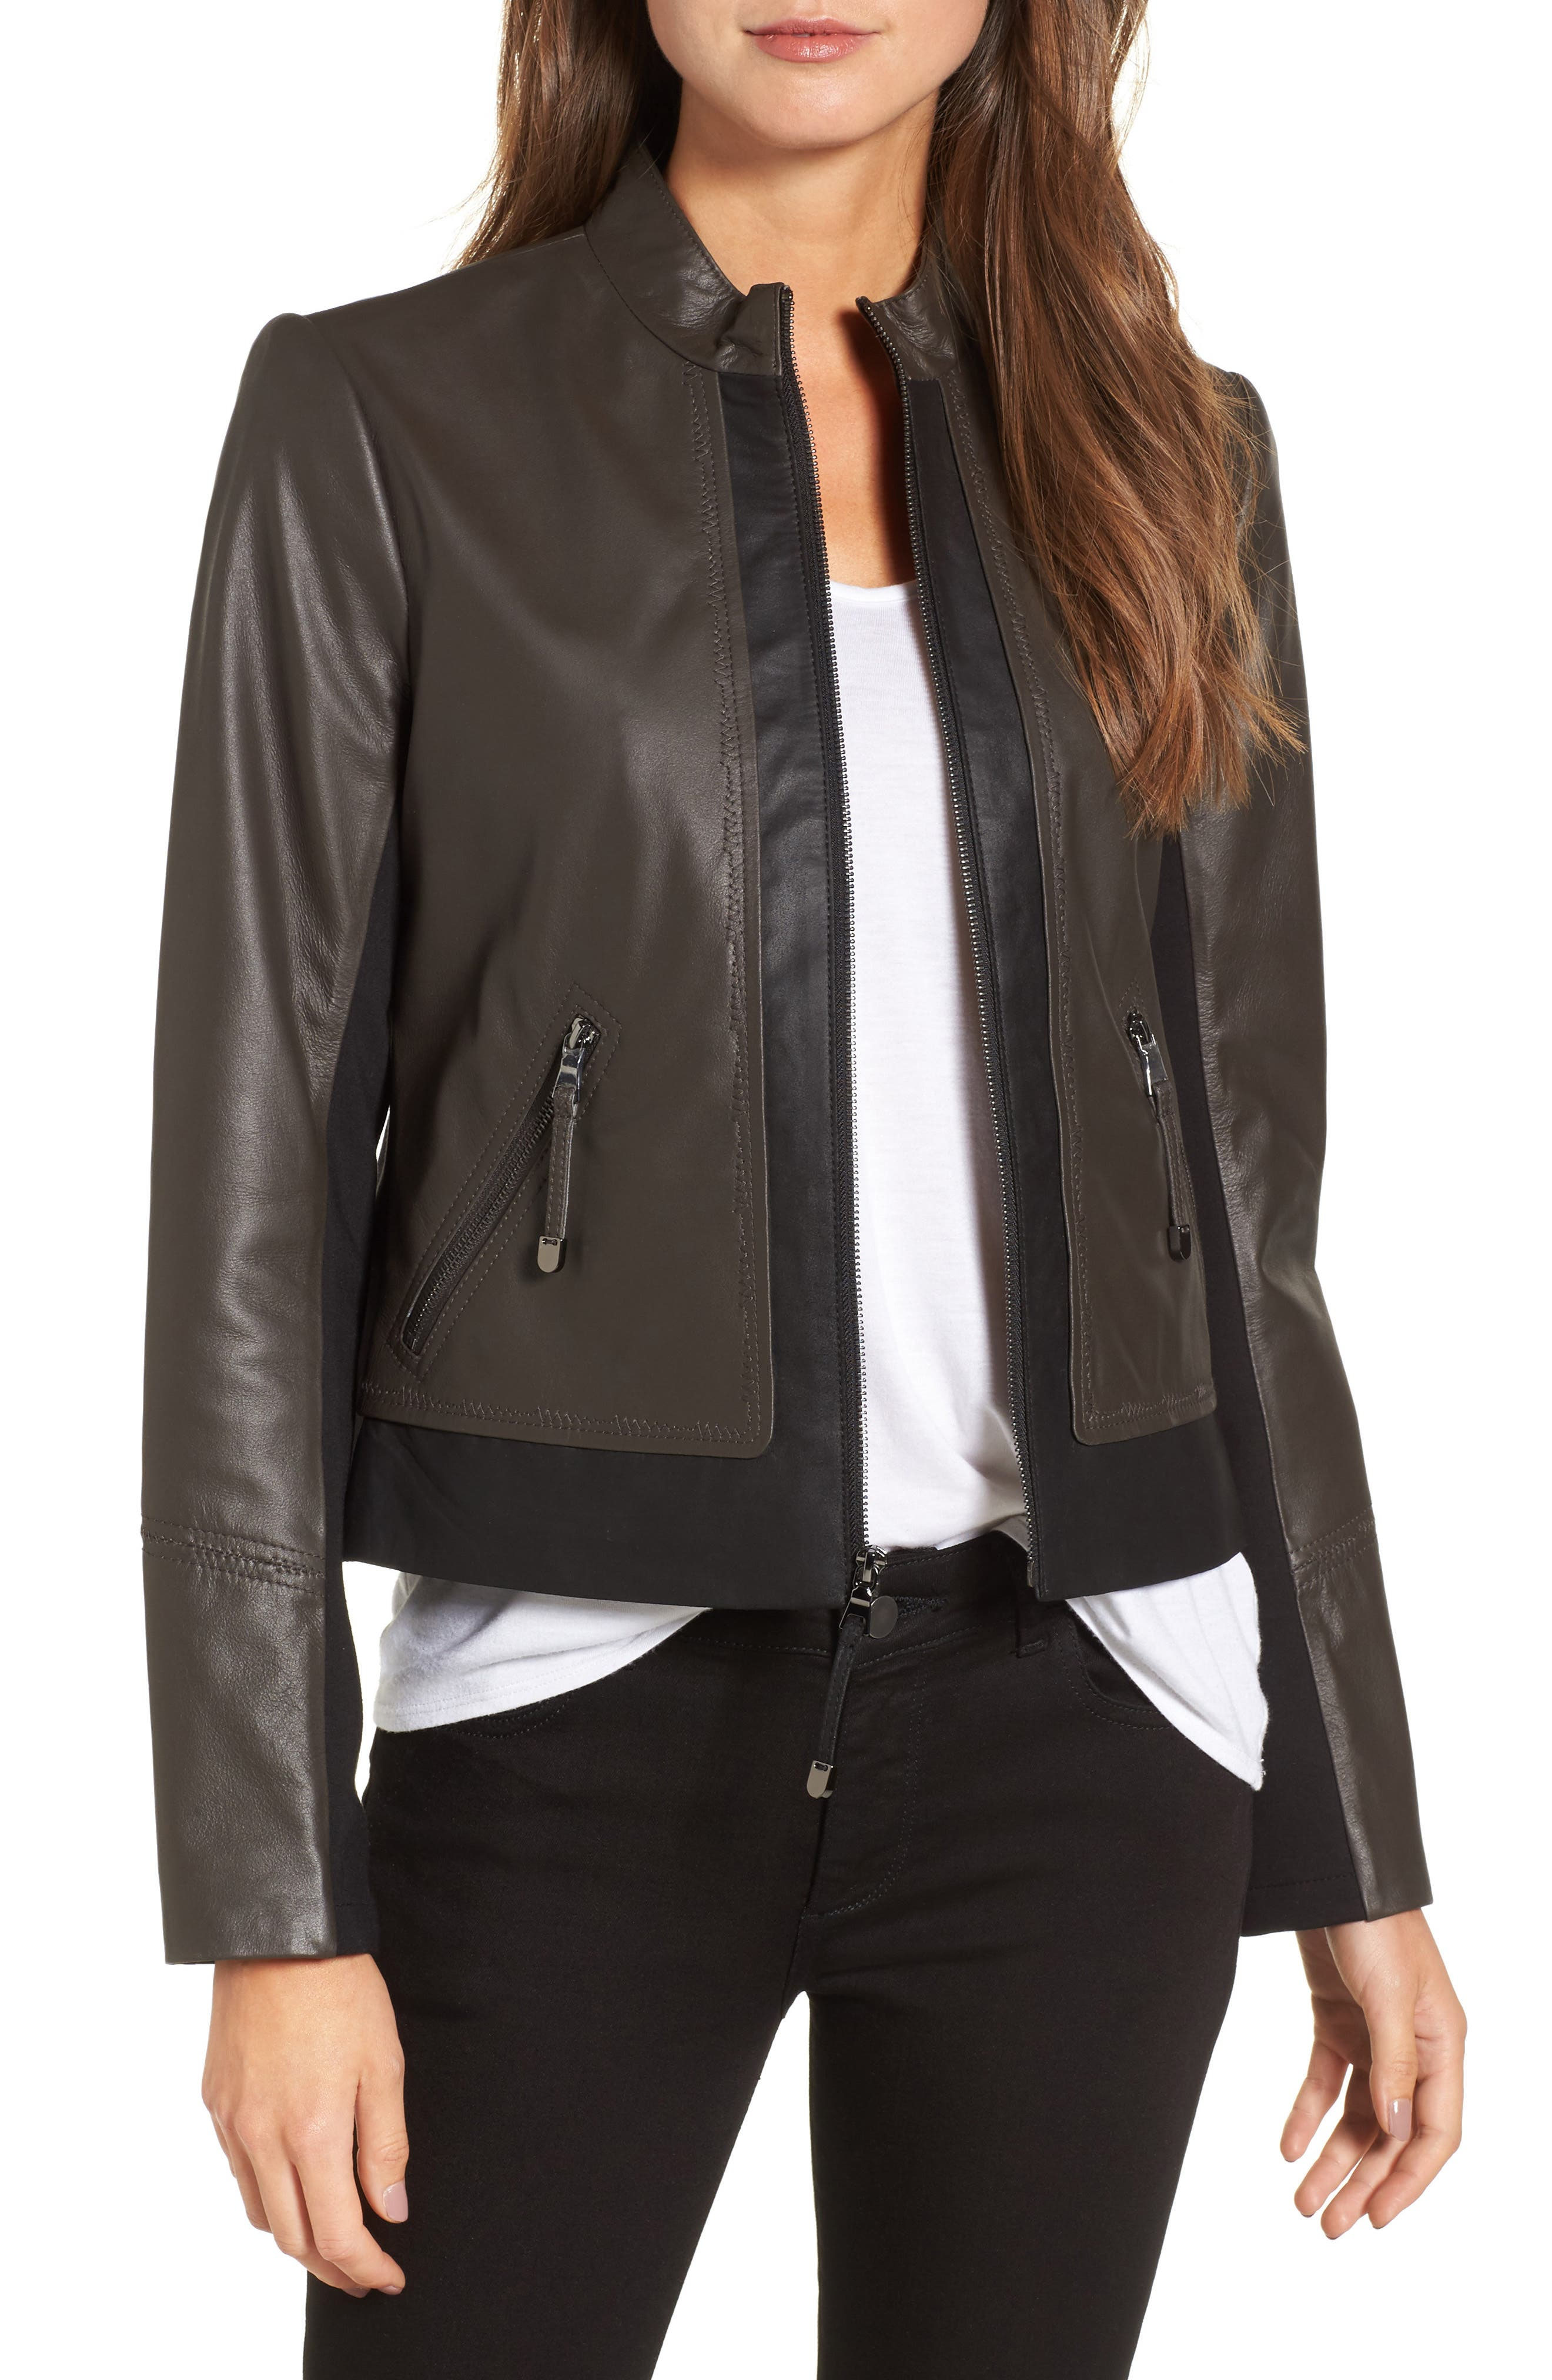 Colorblock Leather Jacket,                         Main,                         color, Black/ Tusk